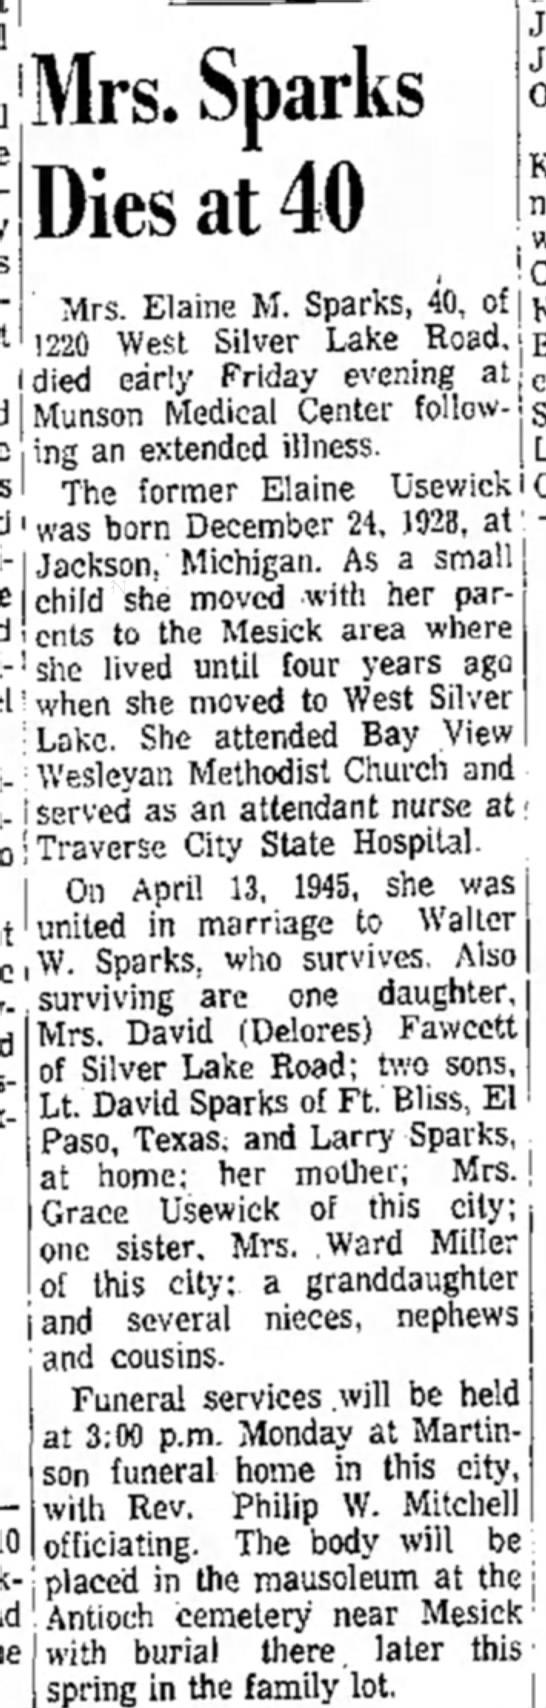 Elaine Usewick Sparks obit - Mrs. Sparks Dies at 40 Mrs. Elaine M. Sparks,...